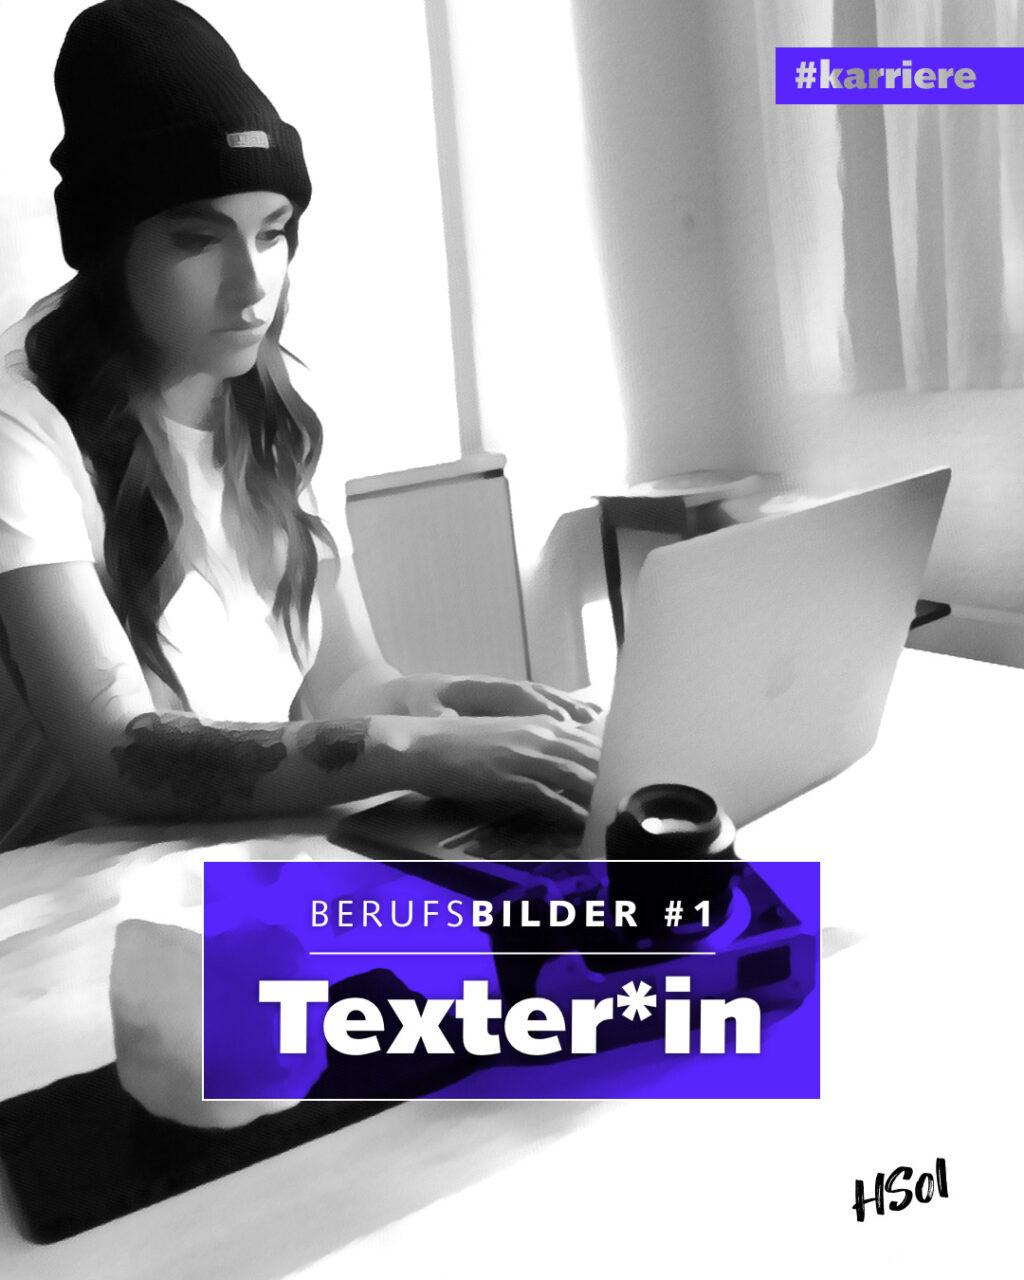 20210125_Berufsbild_TexterIn_s-w_V2